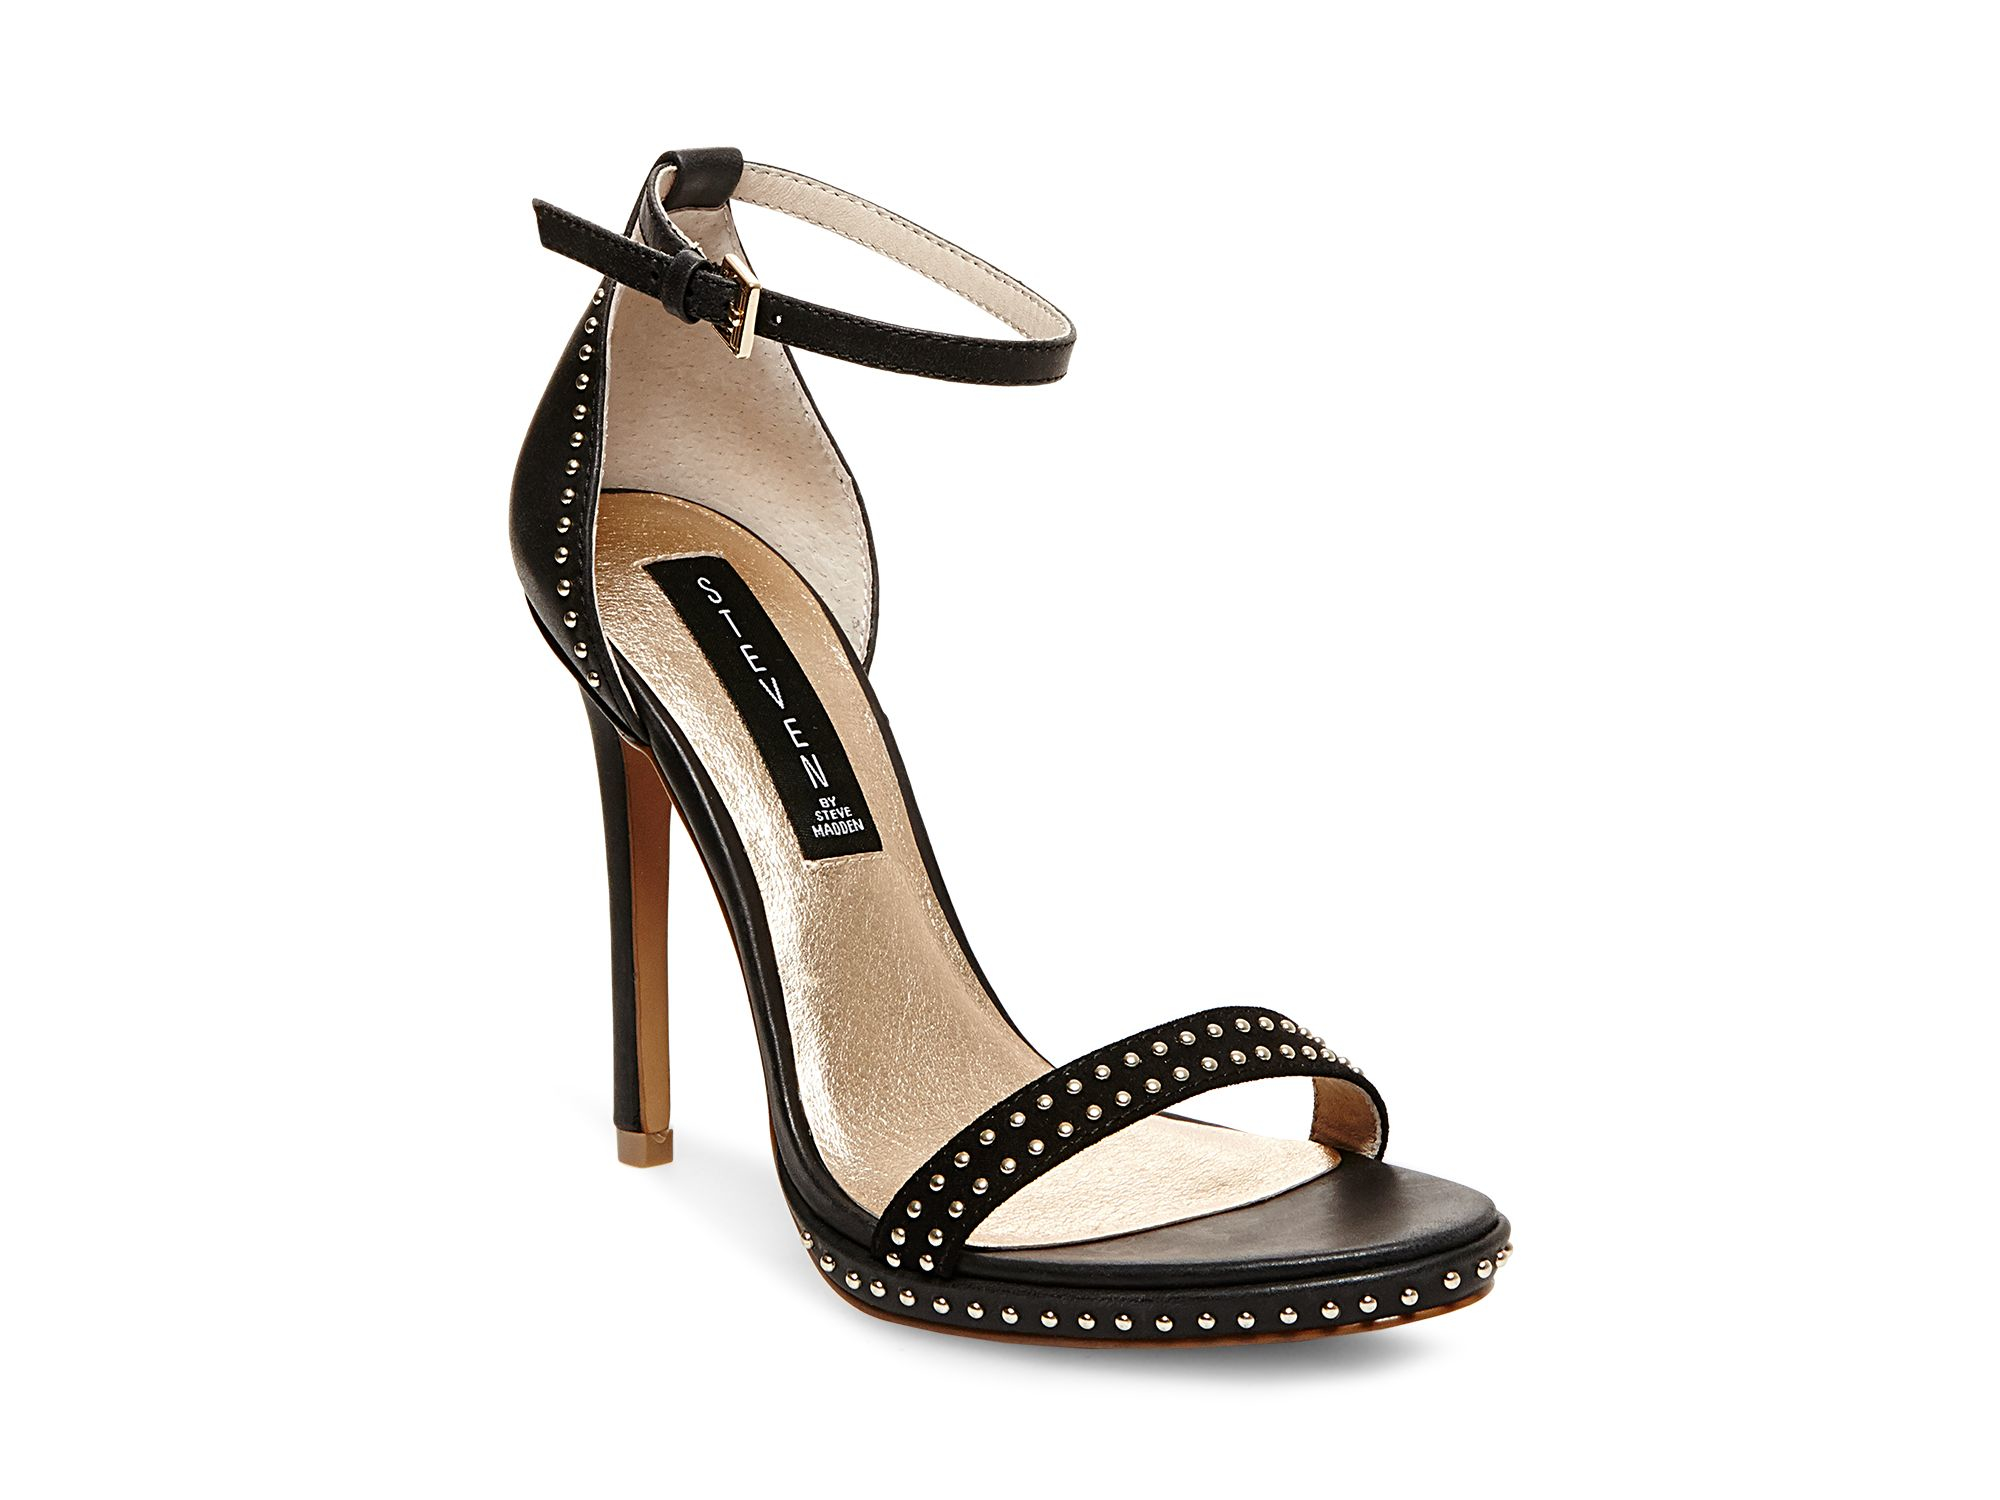 Ankle Strap Sandals High Heel